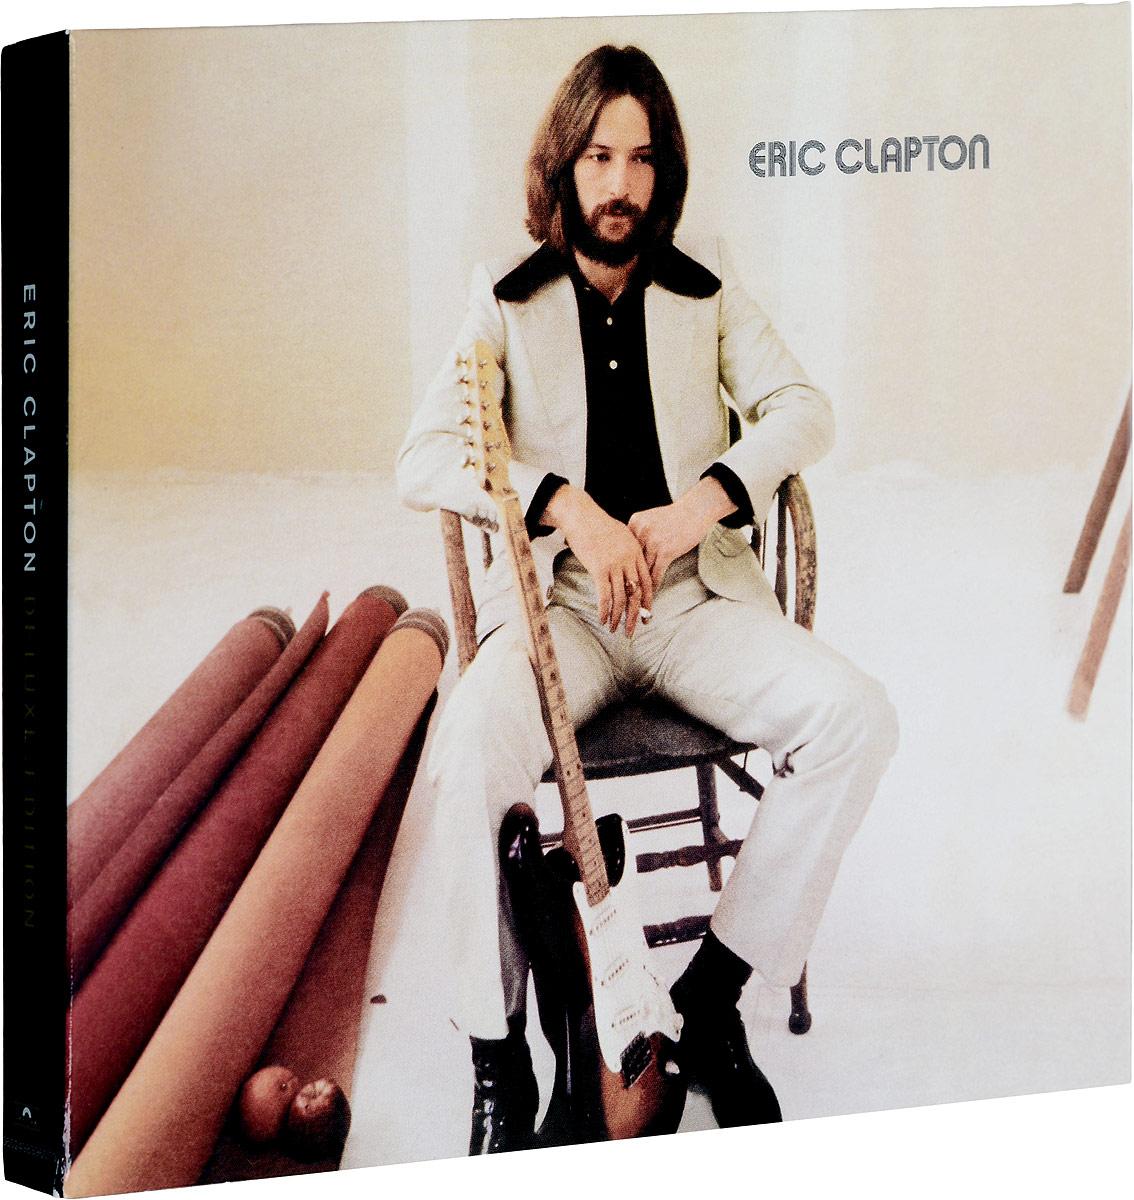 ERIC CLAPTON. ERIC CLAPTON (2 CD) eric nam vancouver